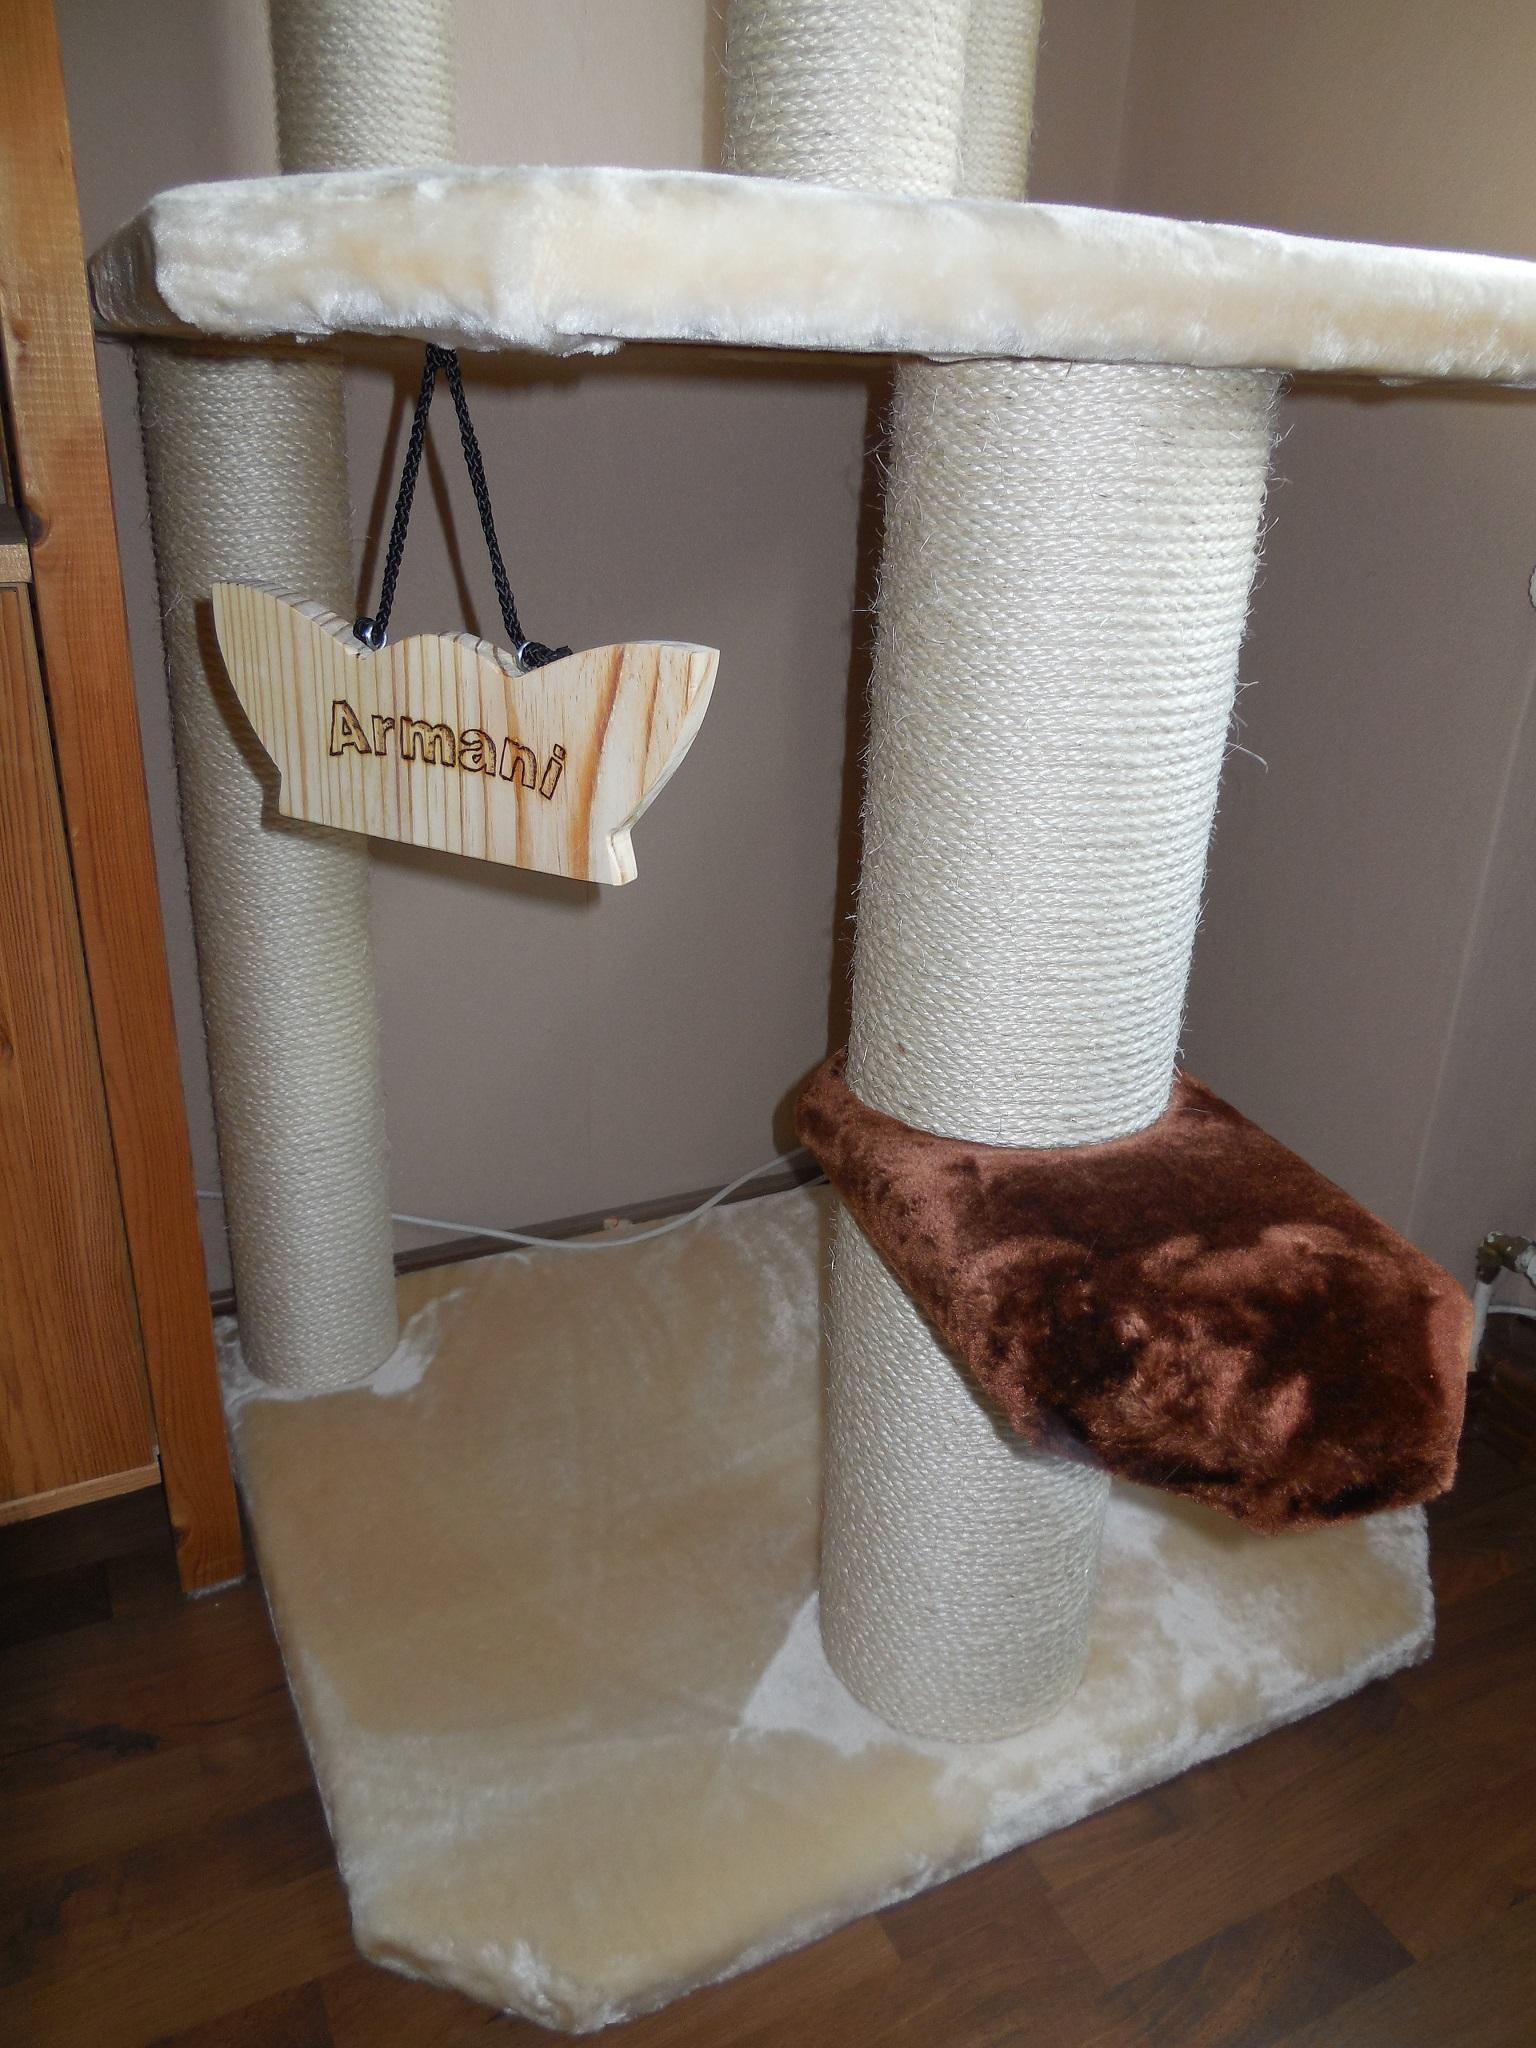 kratzbaum gross armani6. Black Bedroom Furniture Sets. Home Design Ideas